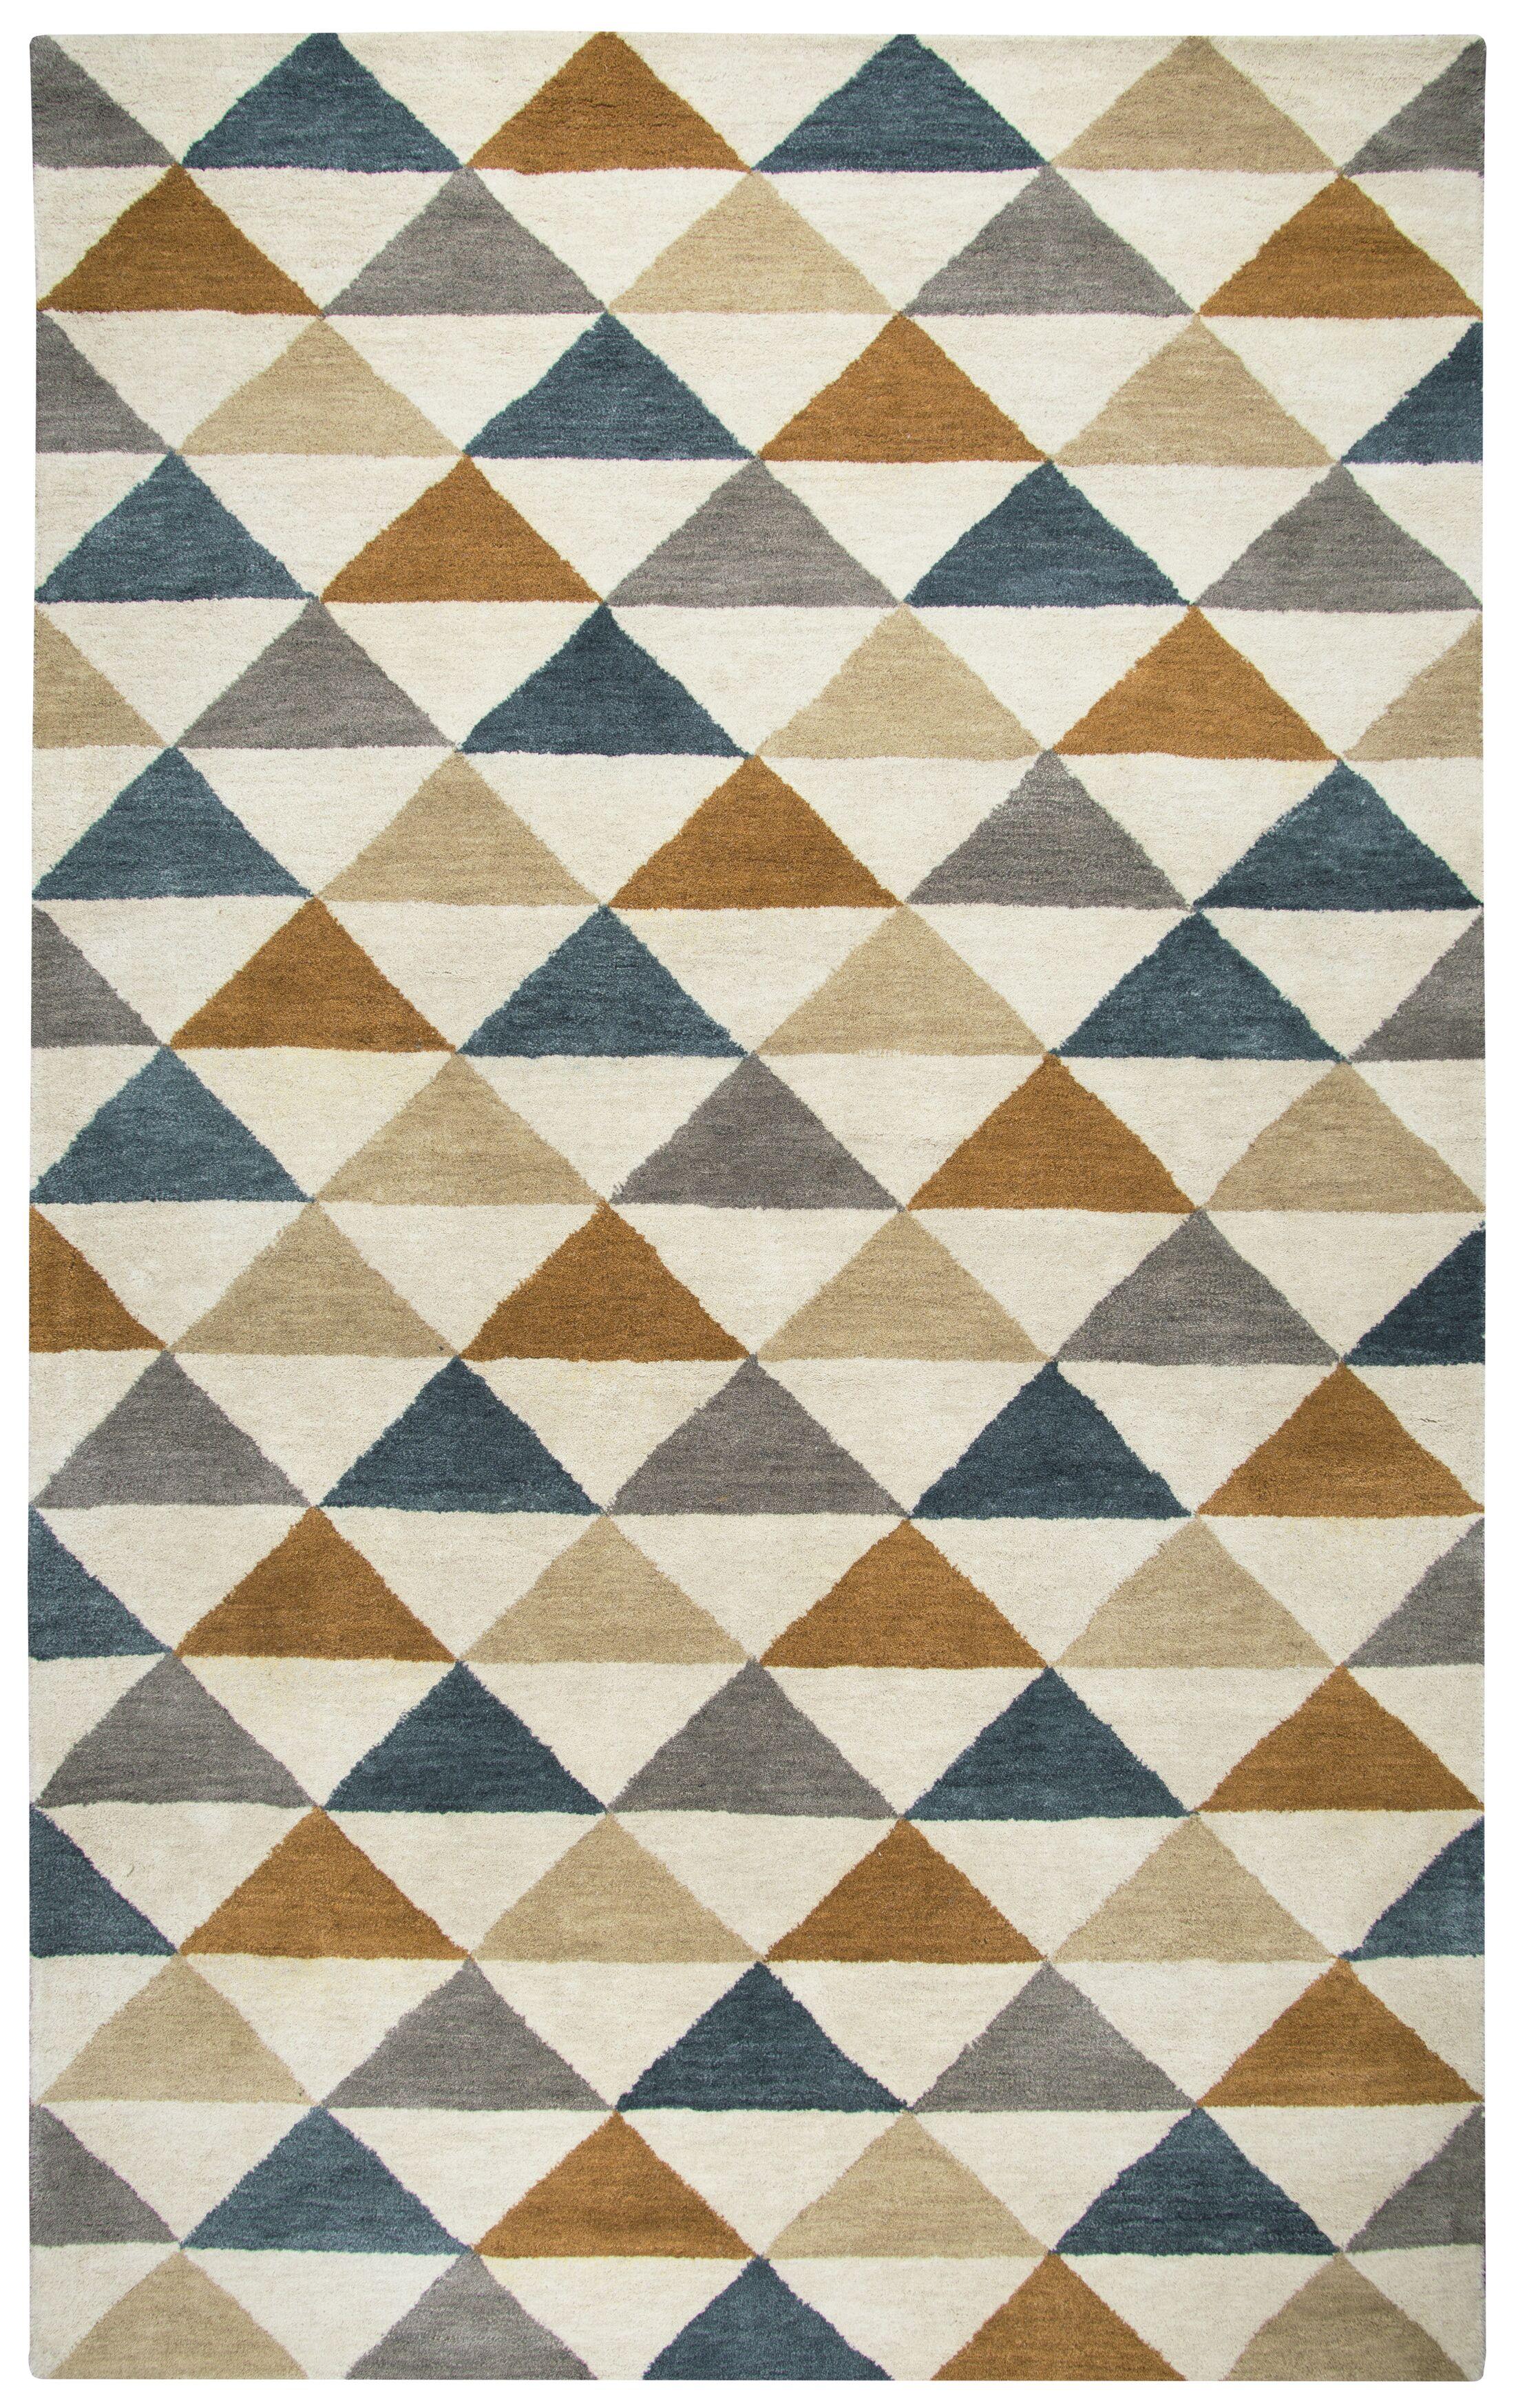 Hargis Hand-Tufted Wool Beige/Navy Area Rug Rug Size: Rectangle 9' x 12'